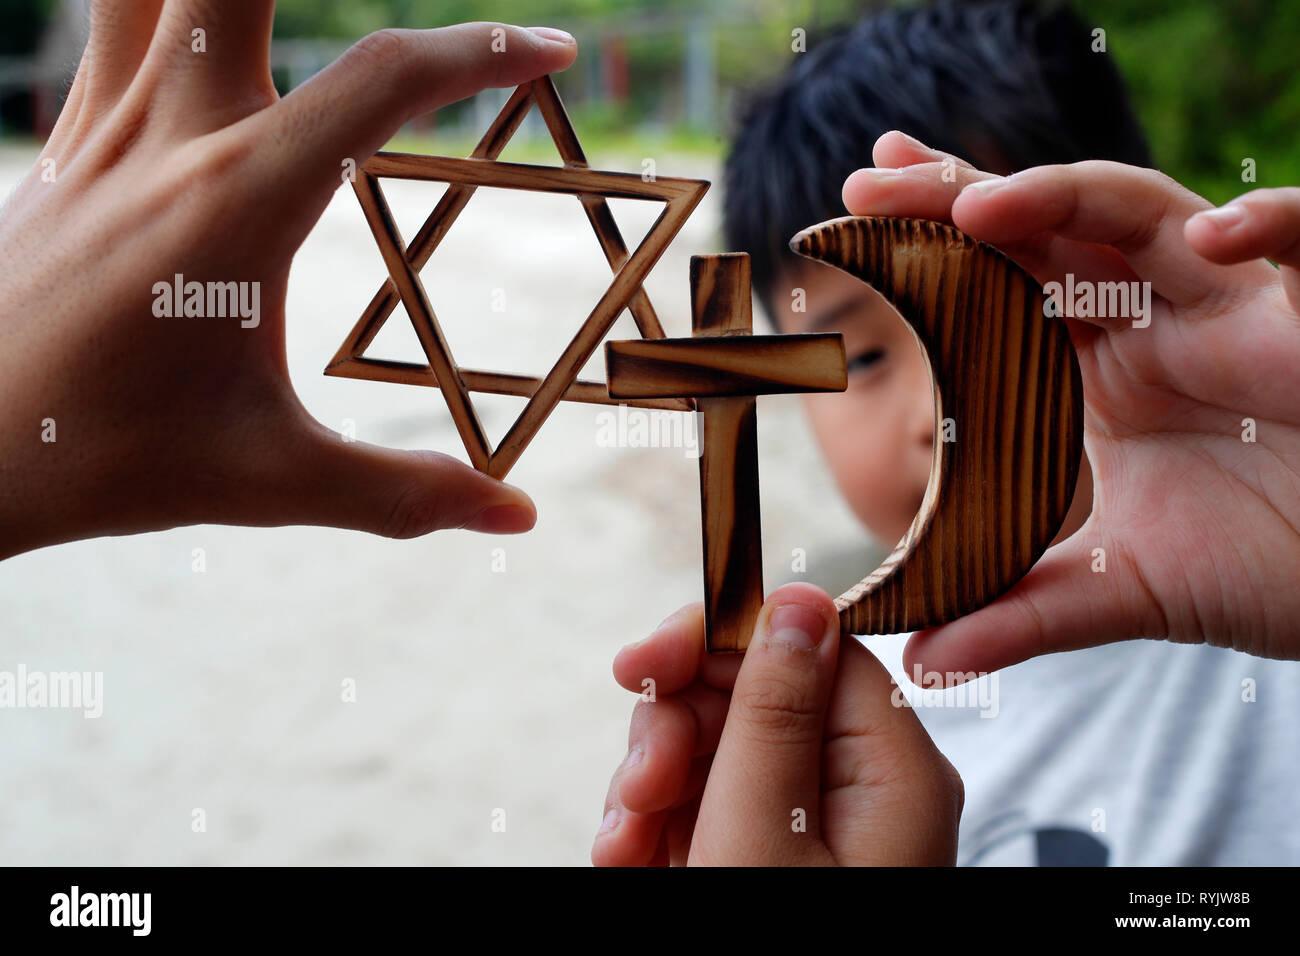 Christianity, Islam, Judaism  3  monotheistic religions. Jewish  Star, Cross and Crescent :  Interreligious symbols in hands. - Stock Image